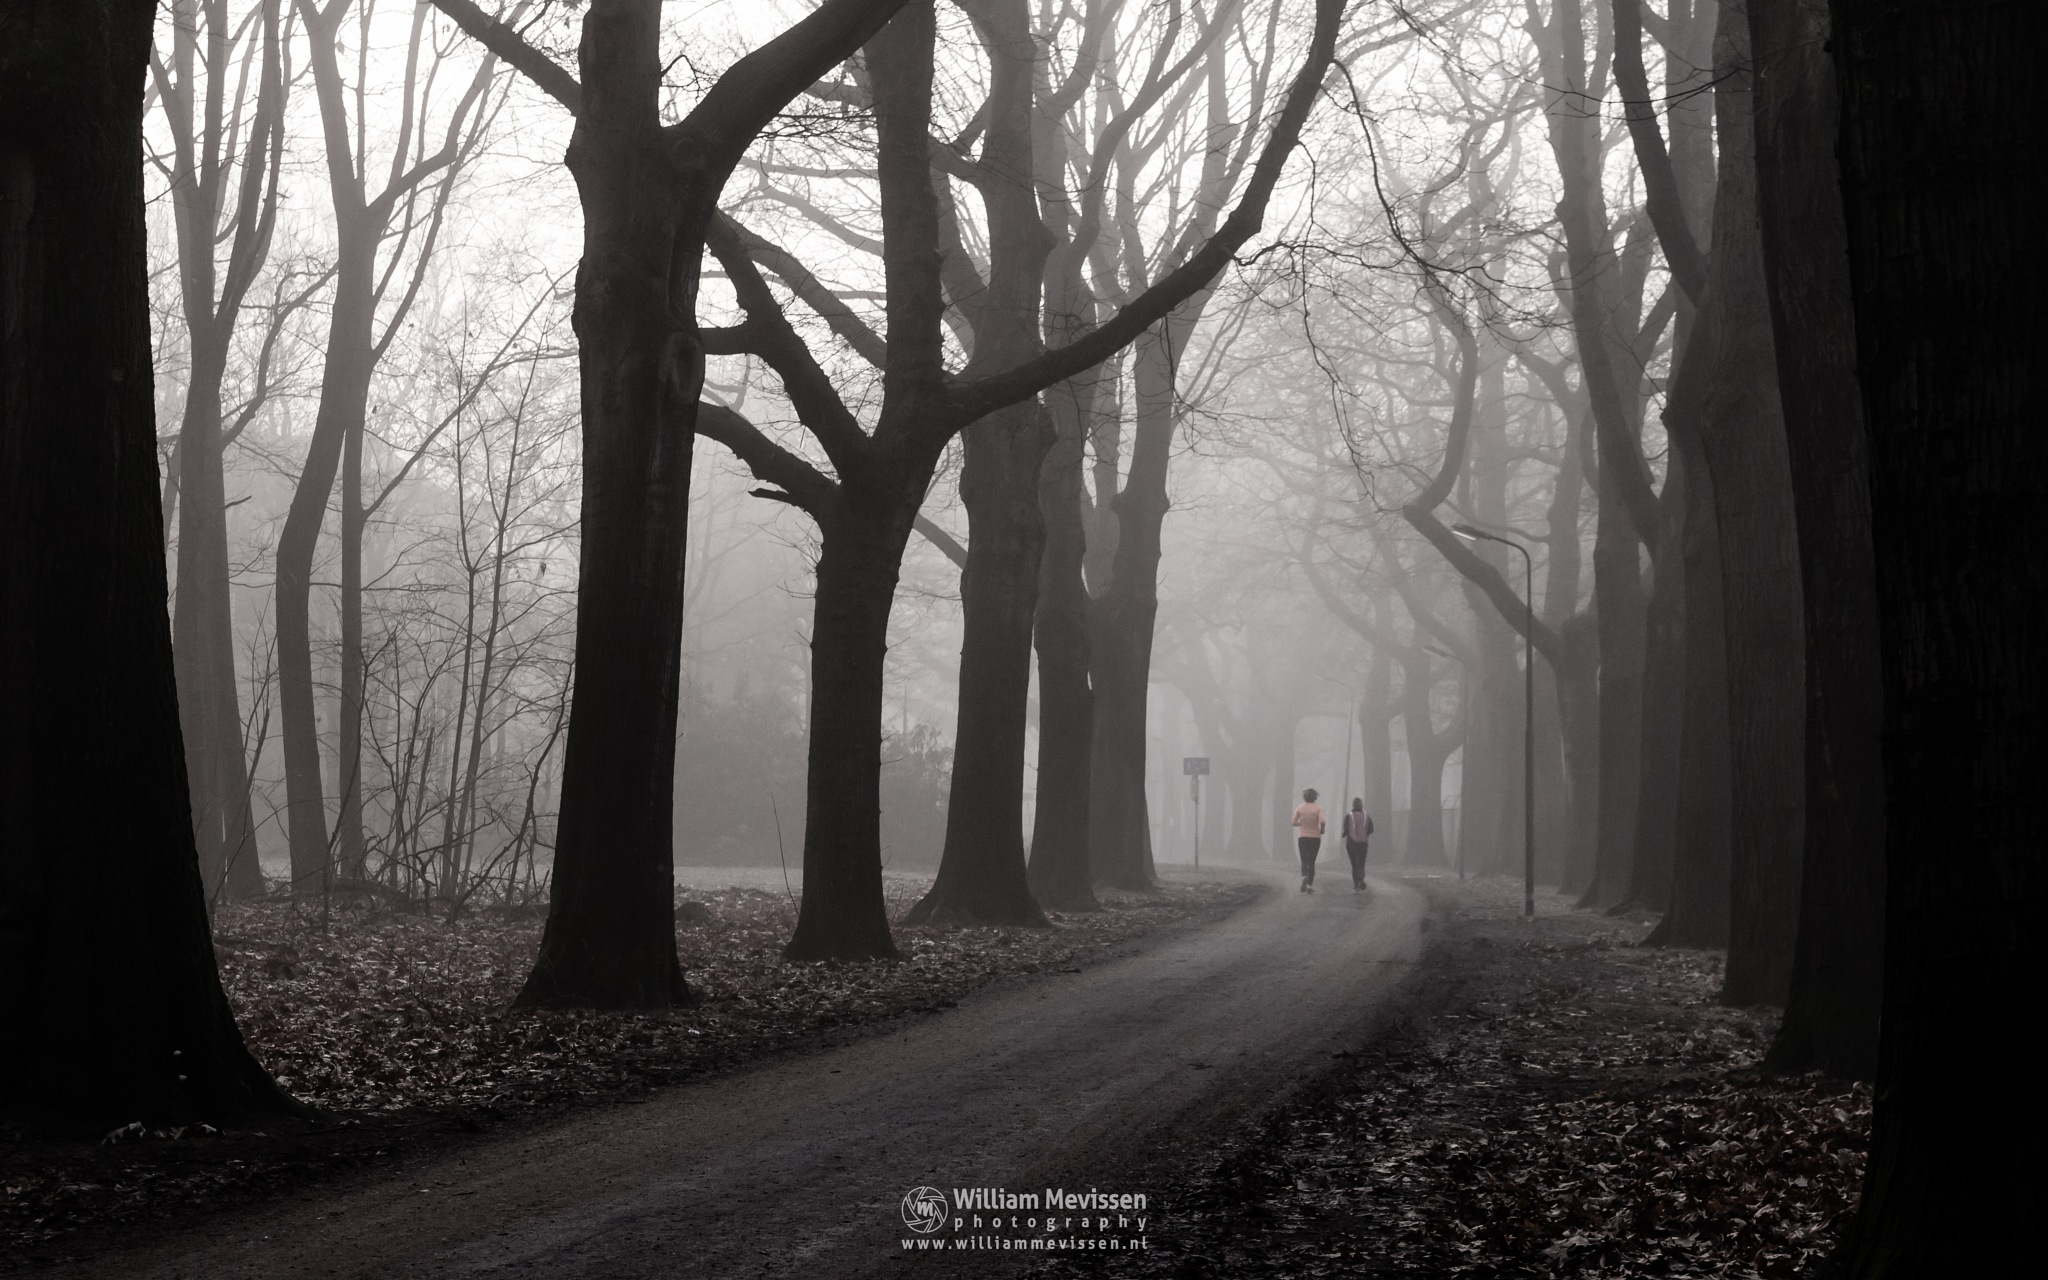 Jogging by William Mevissen